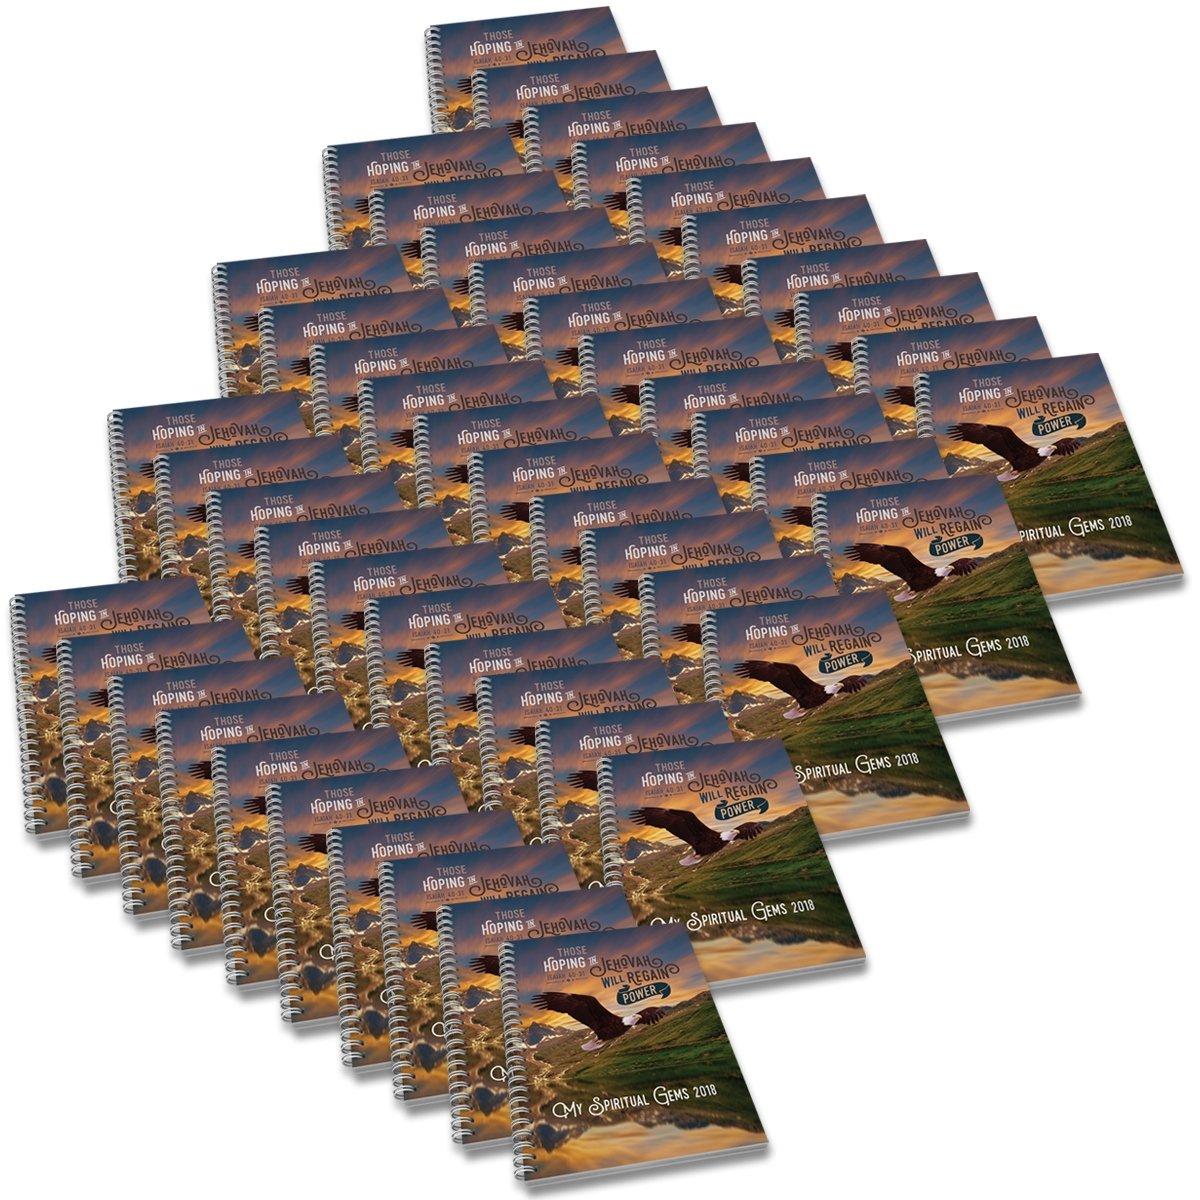 ''My Spiritual Gems'' 2018 Meeting Workbook Companion with JW yeartext - [US$149.99] 50-pack